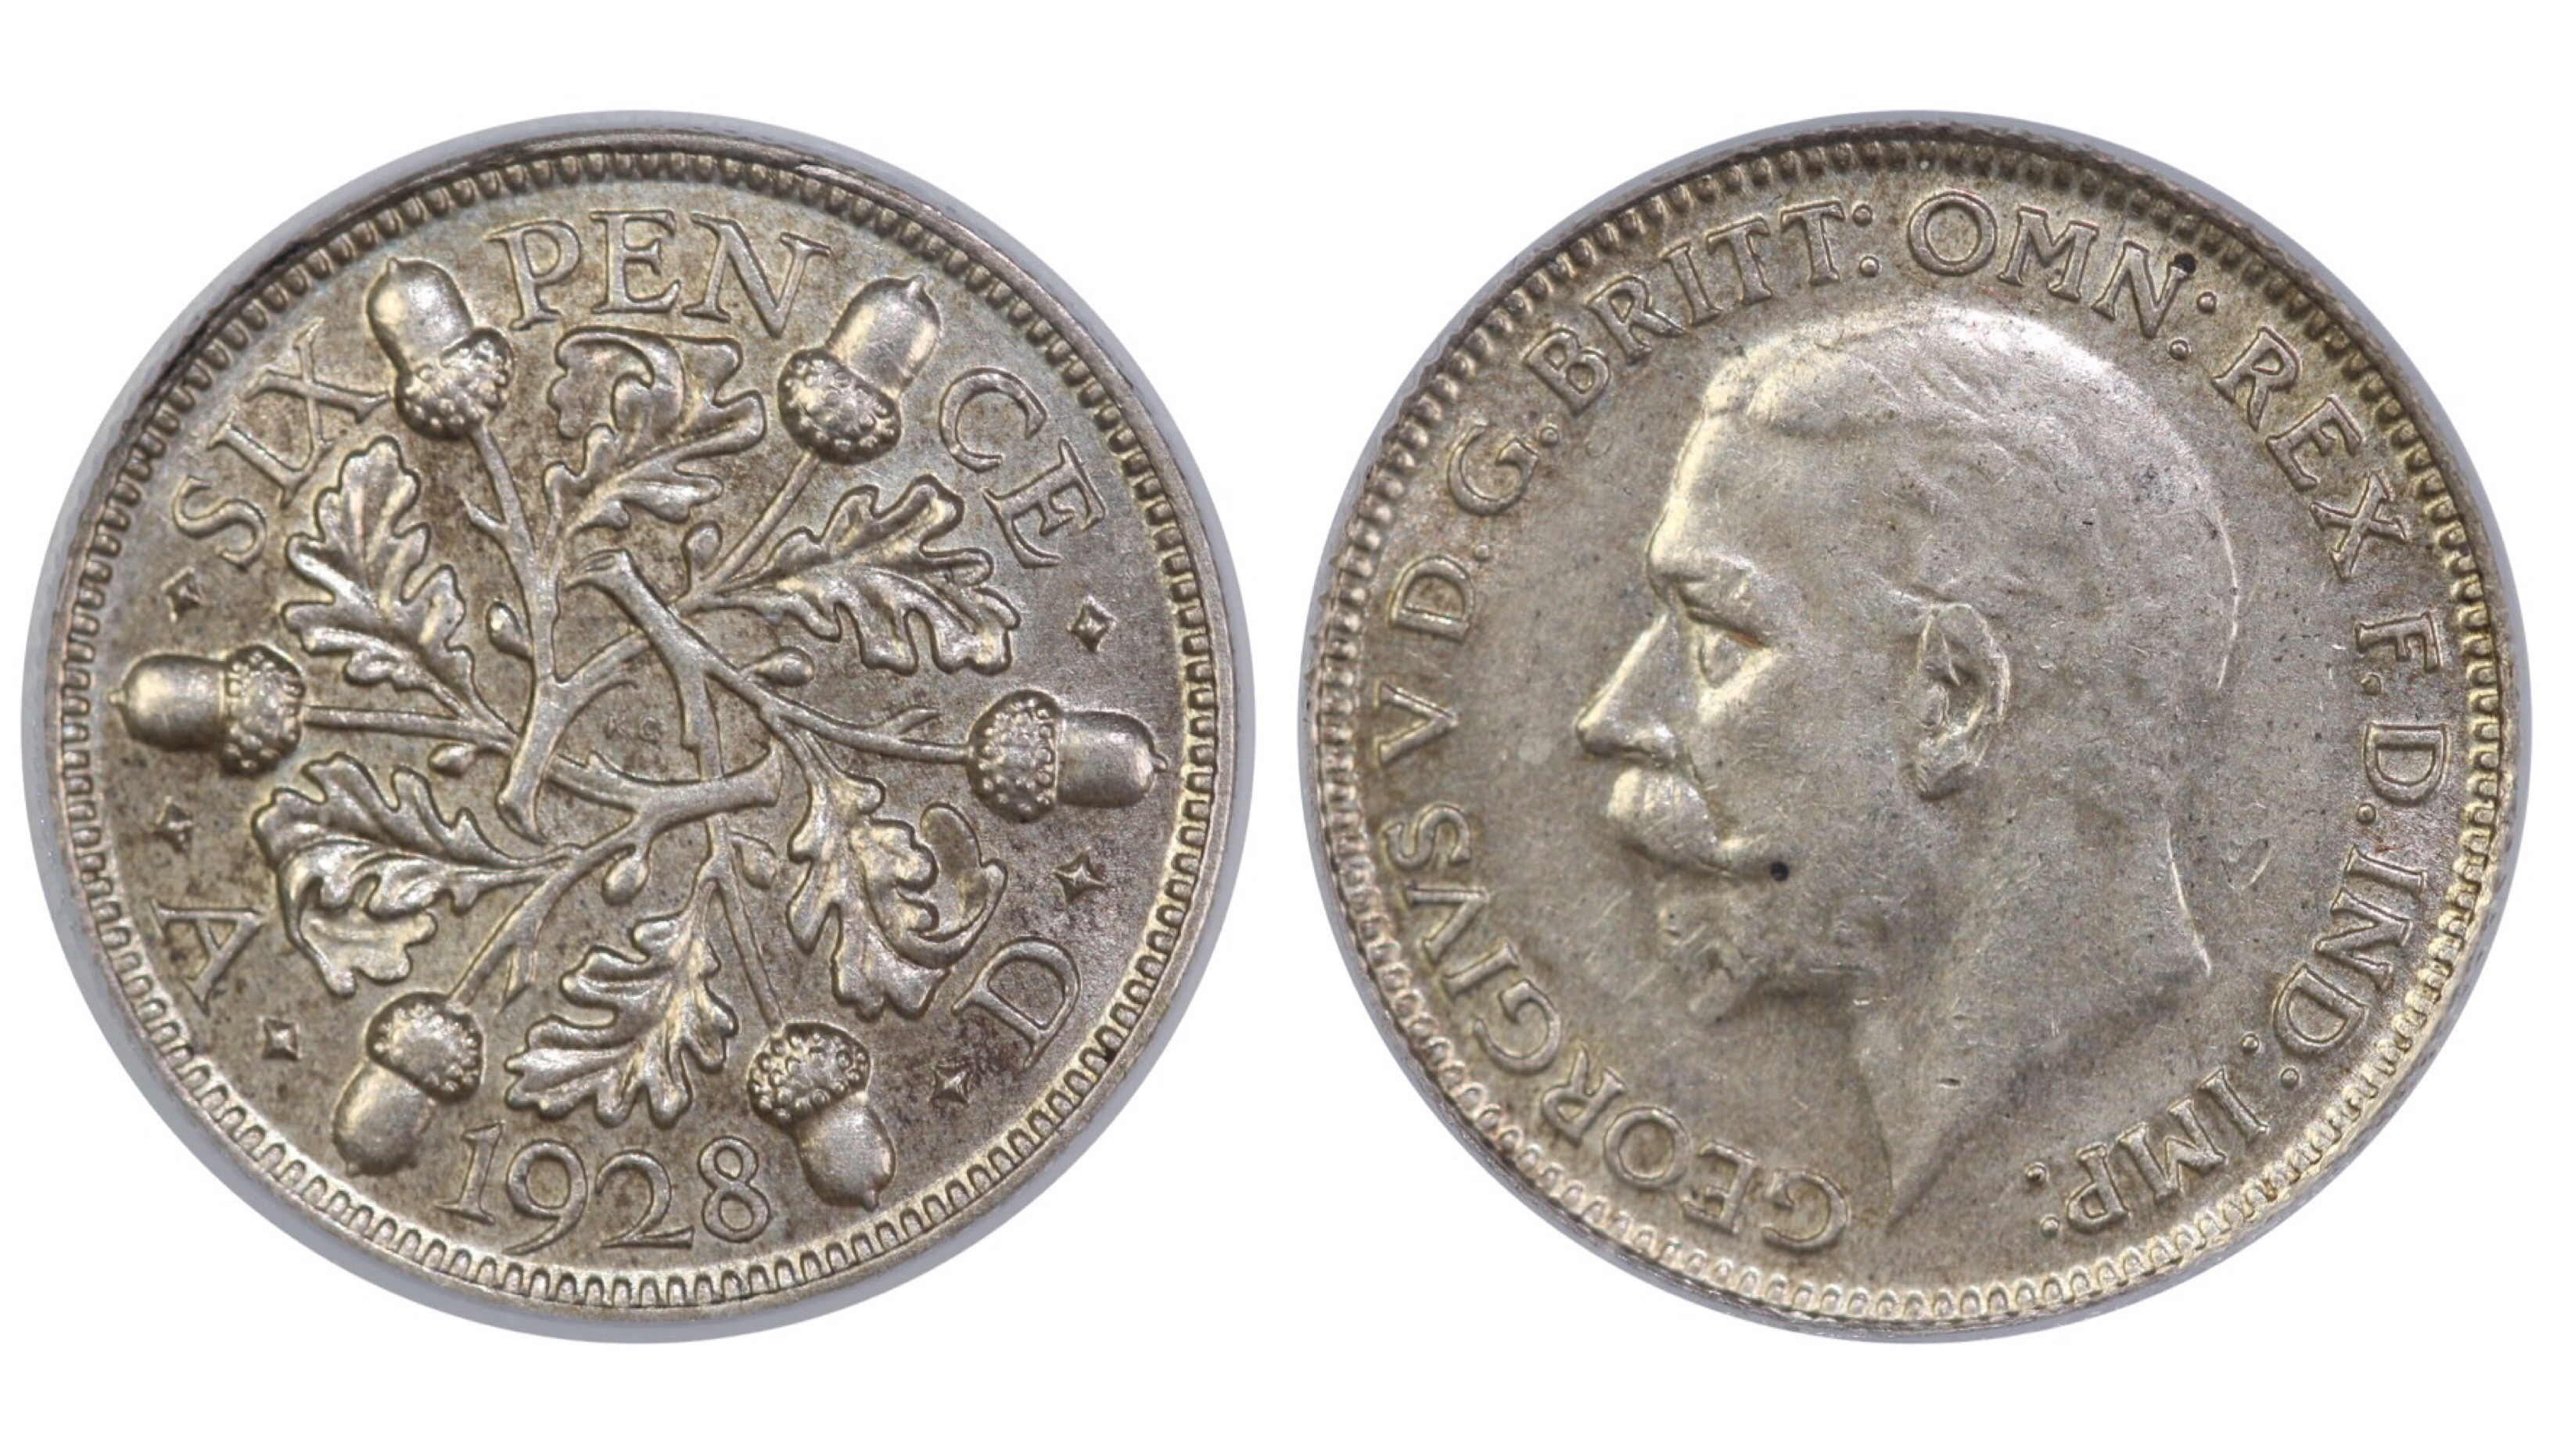 1928 Sixpence, CGS 65, George V, ESC 1817, UIN 22862